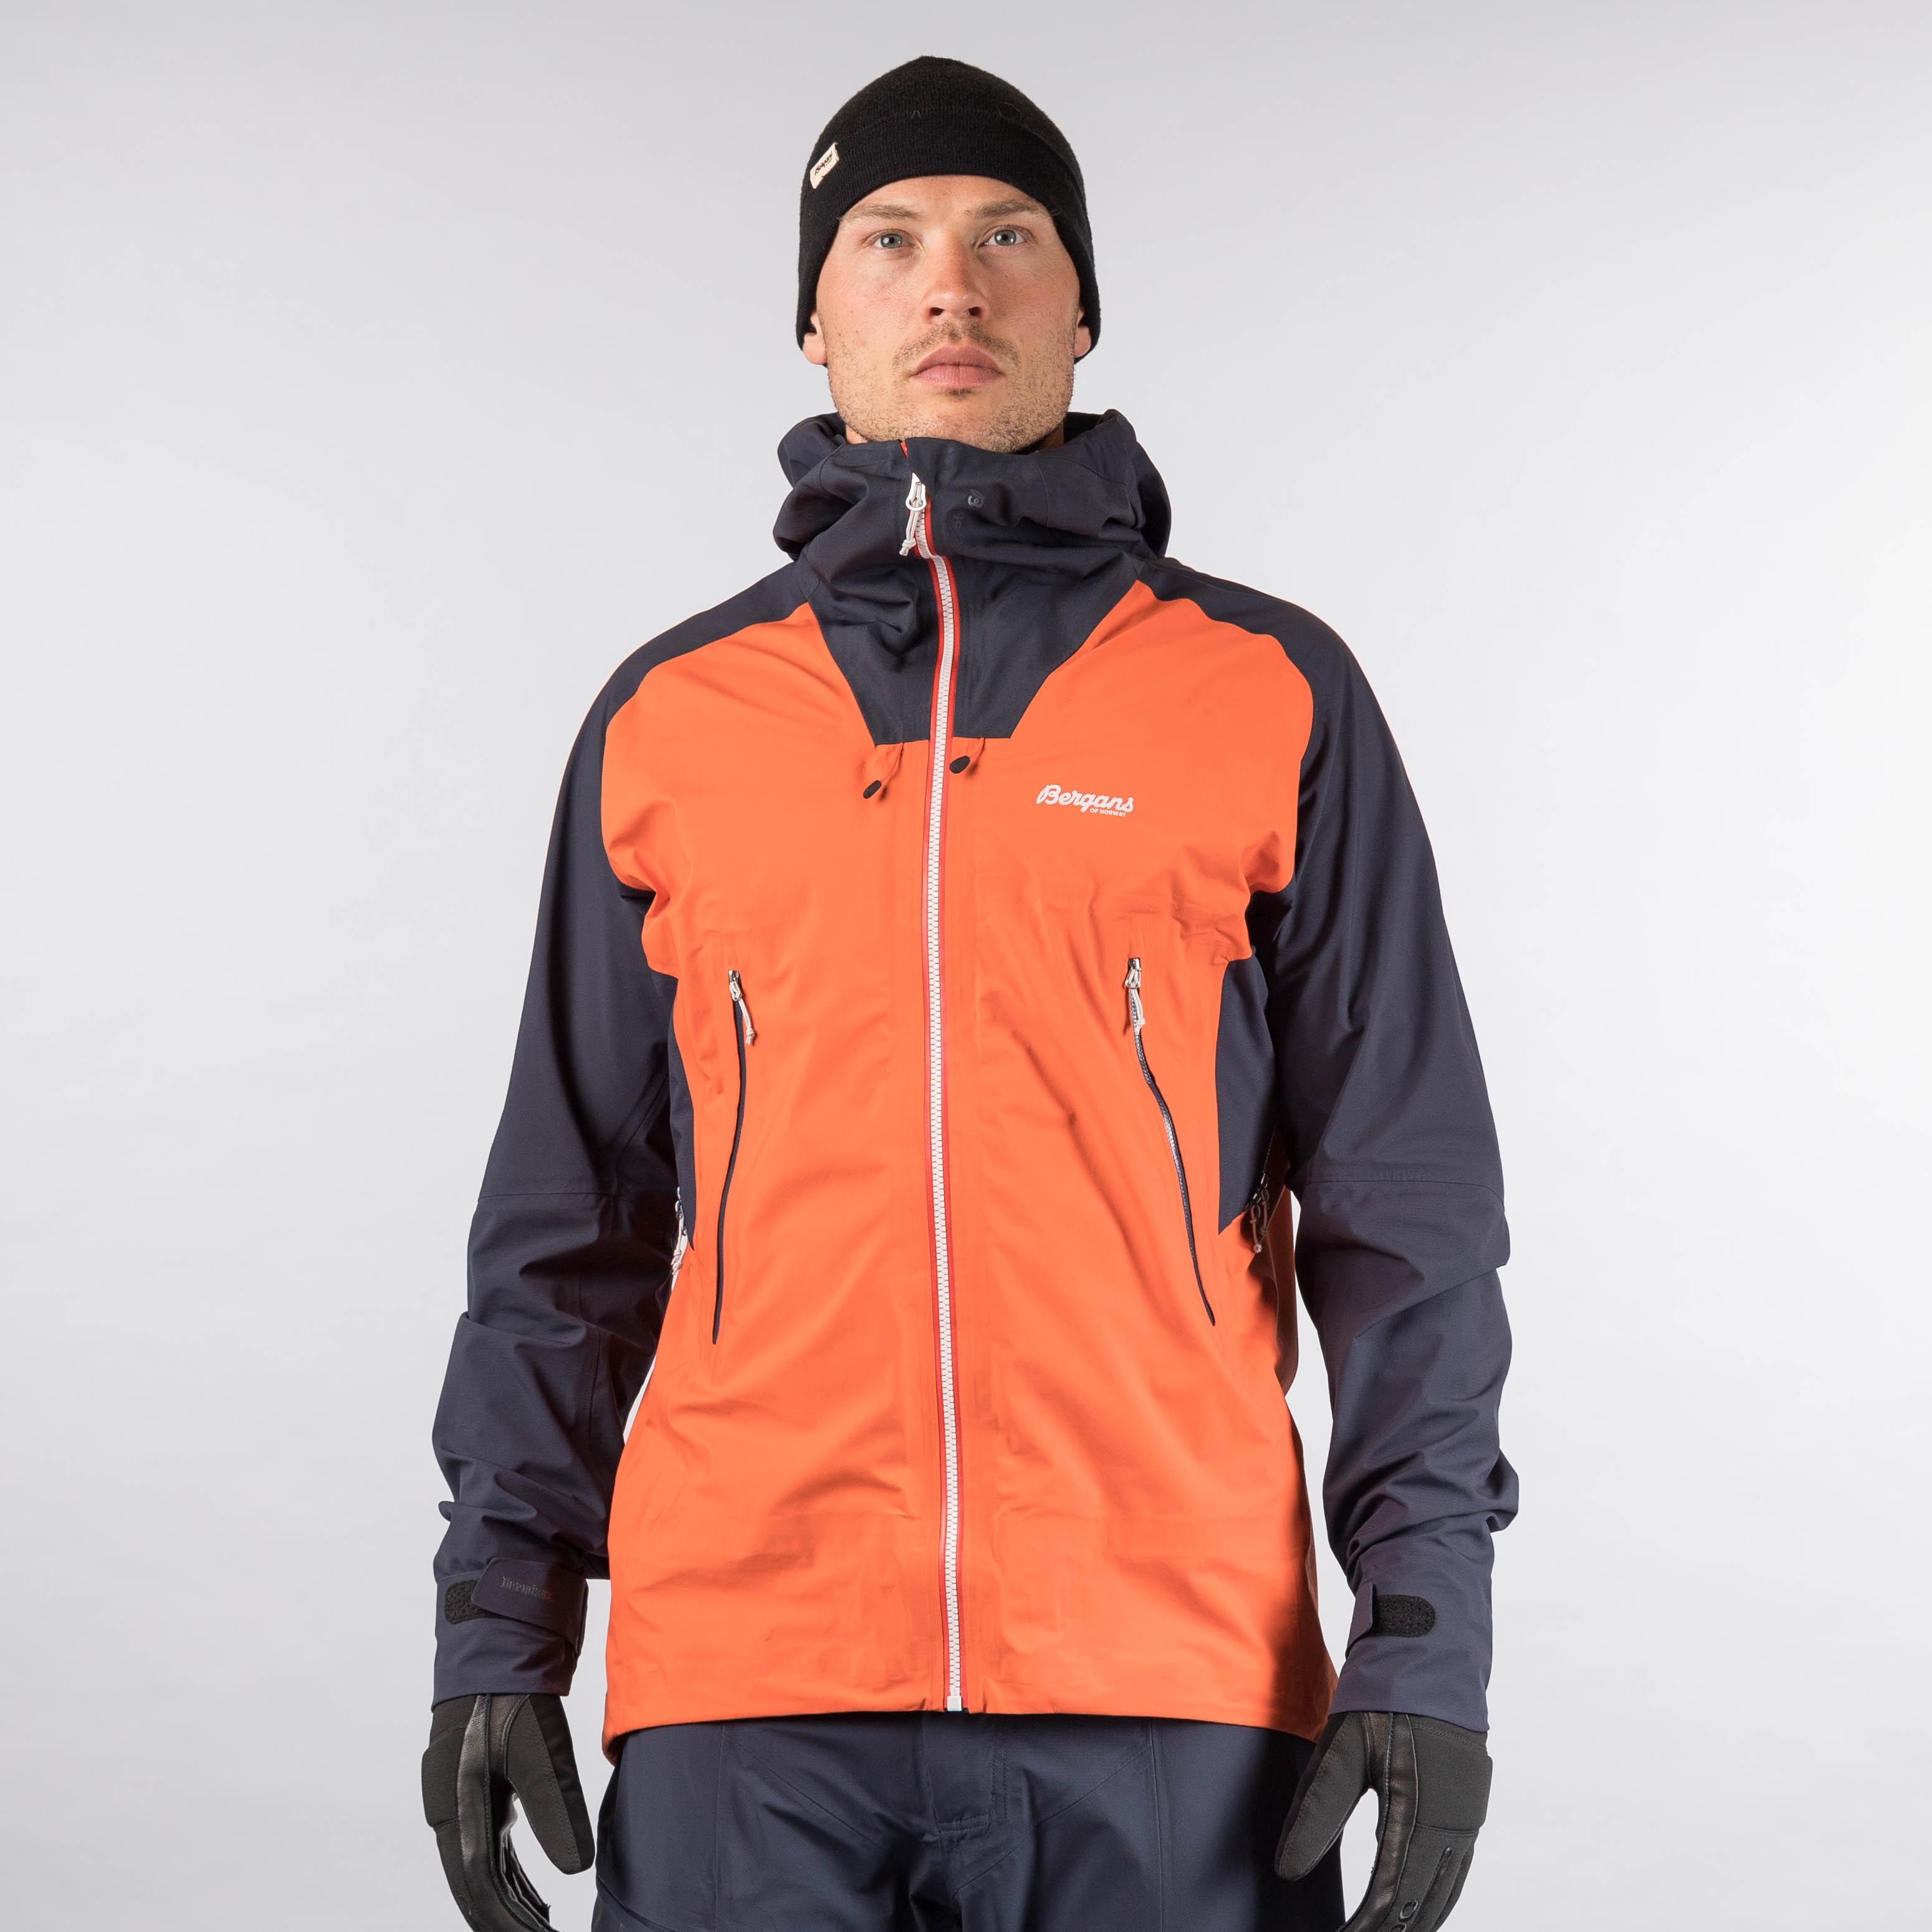 Slingsby 3L Jacket